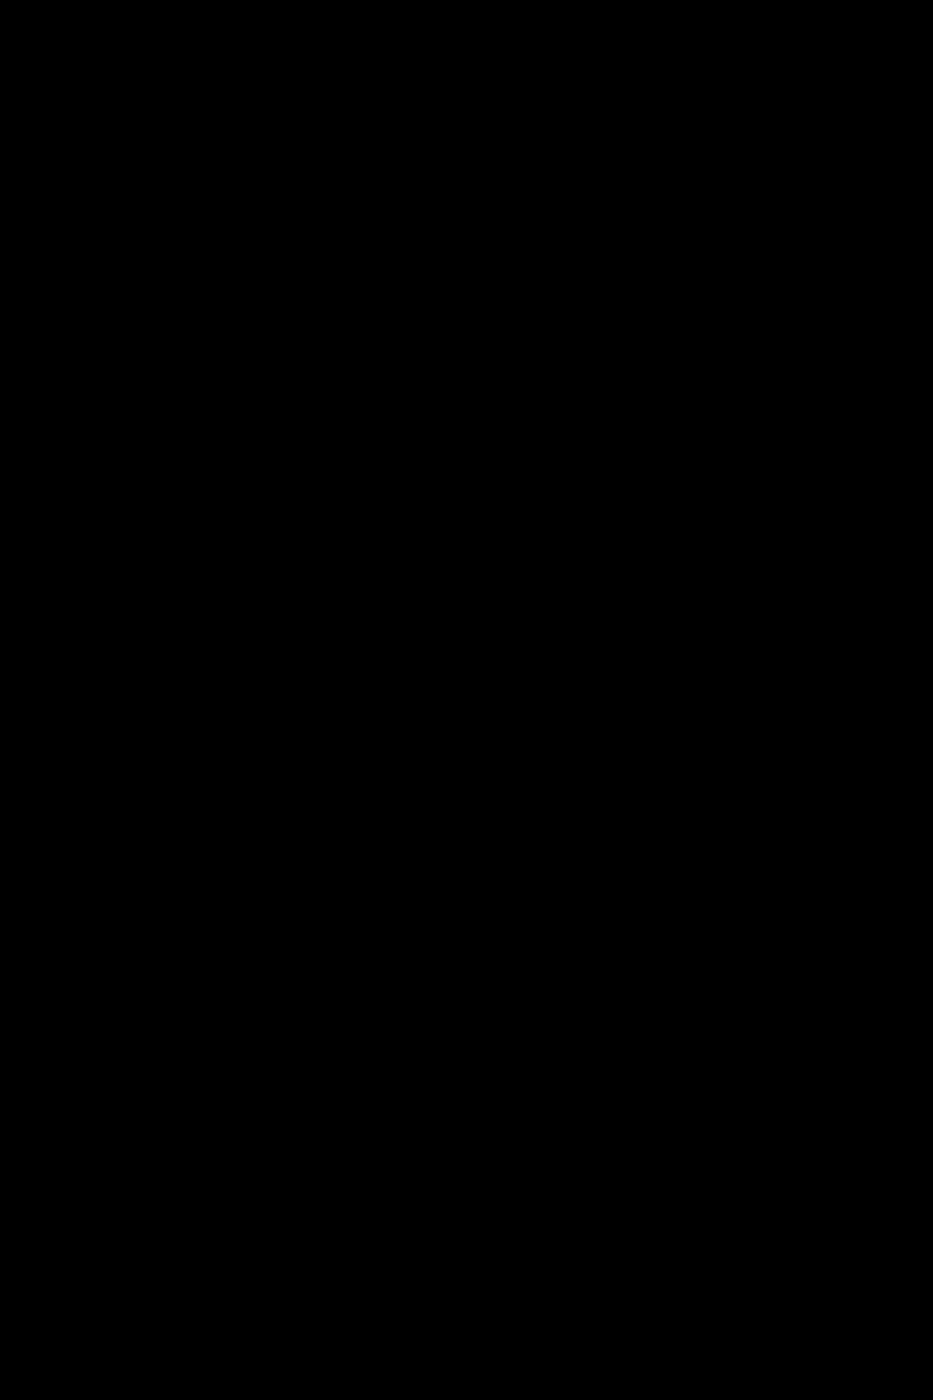 A-409